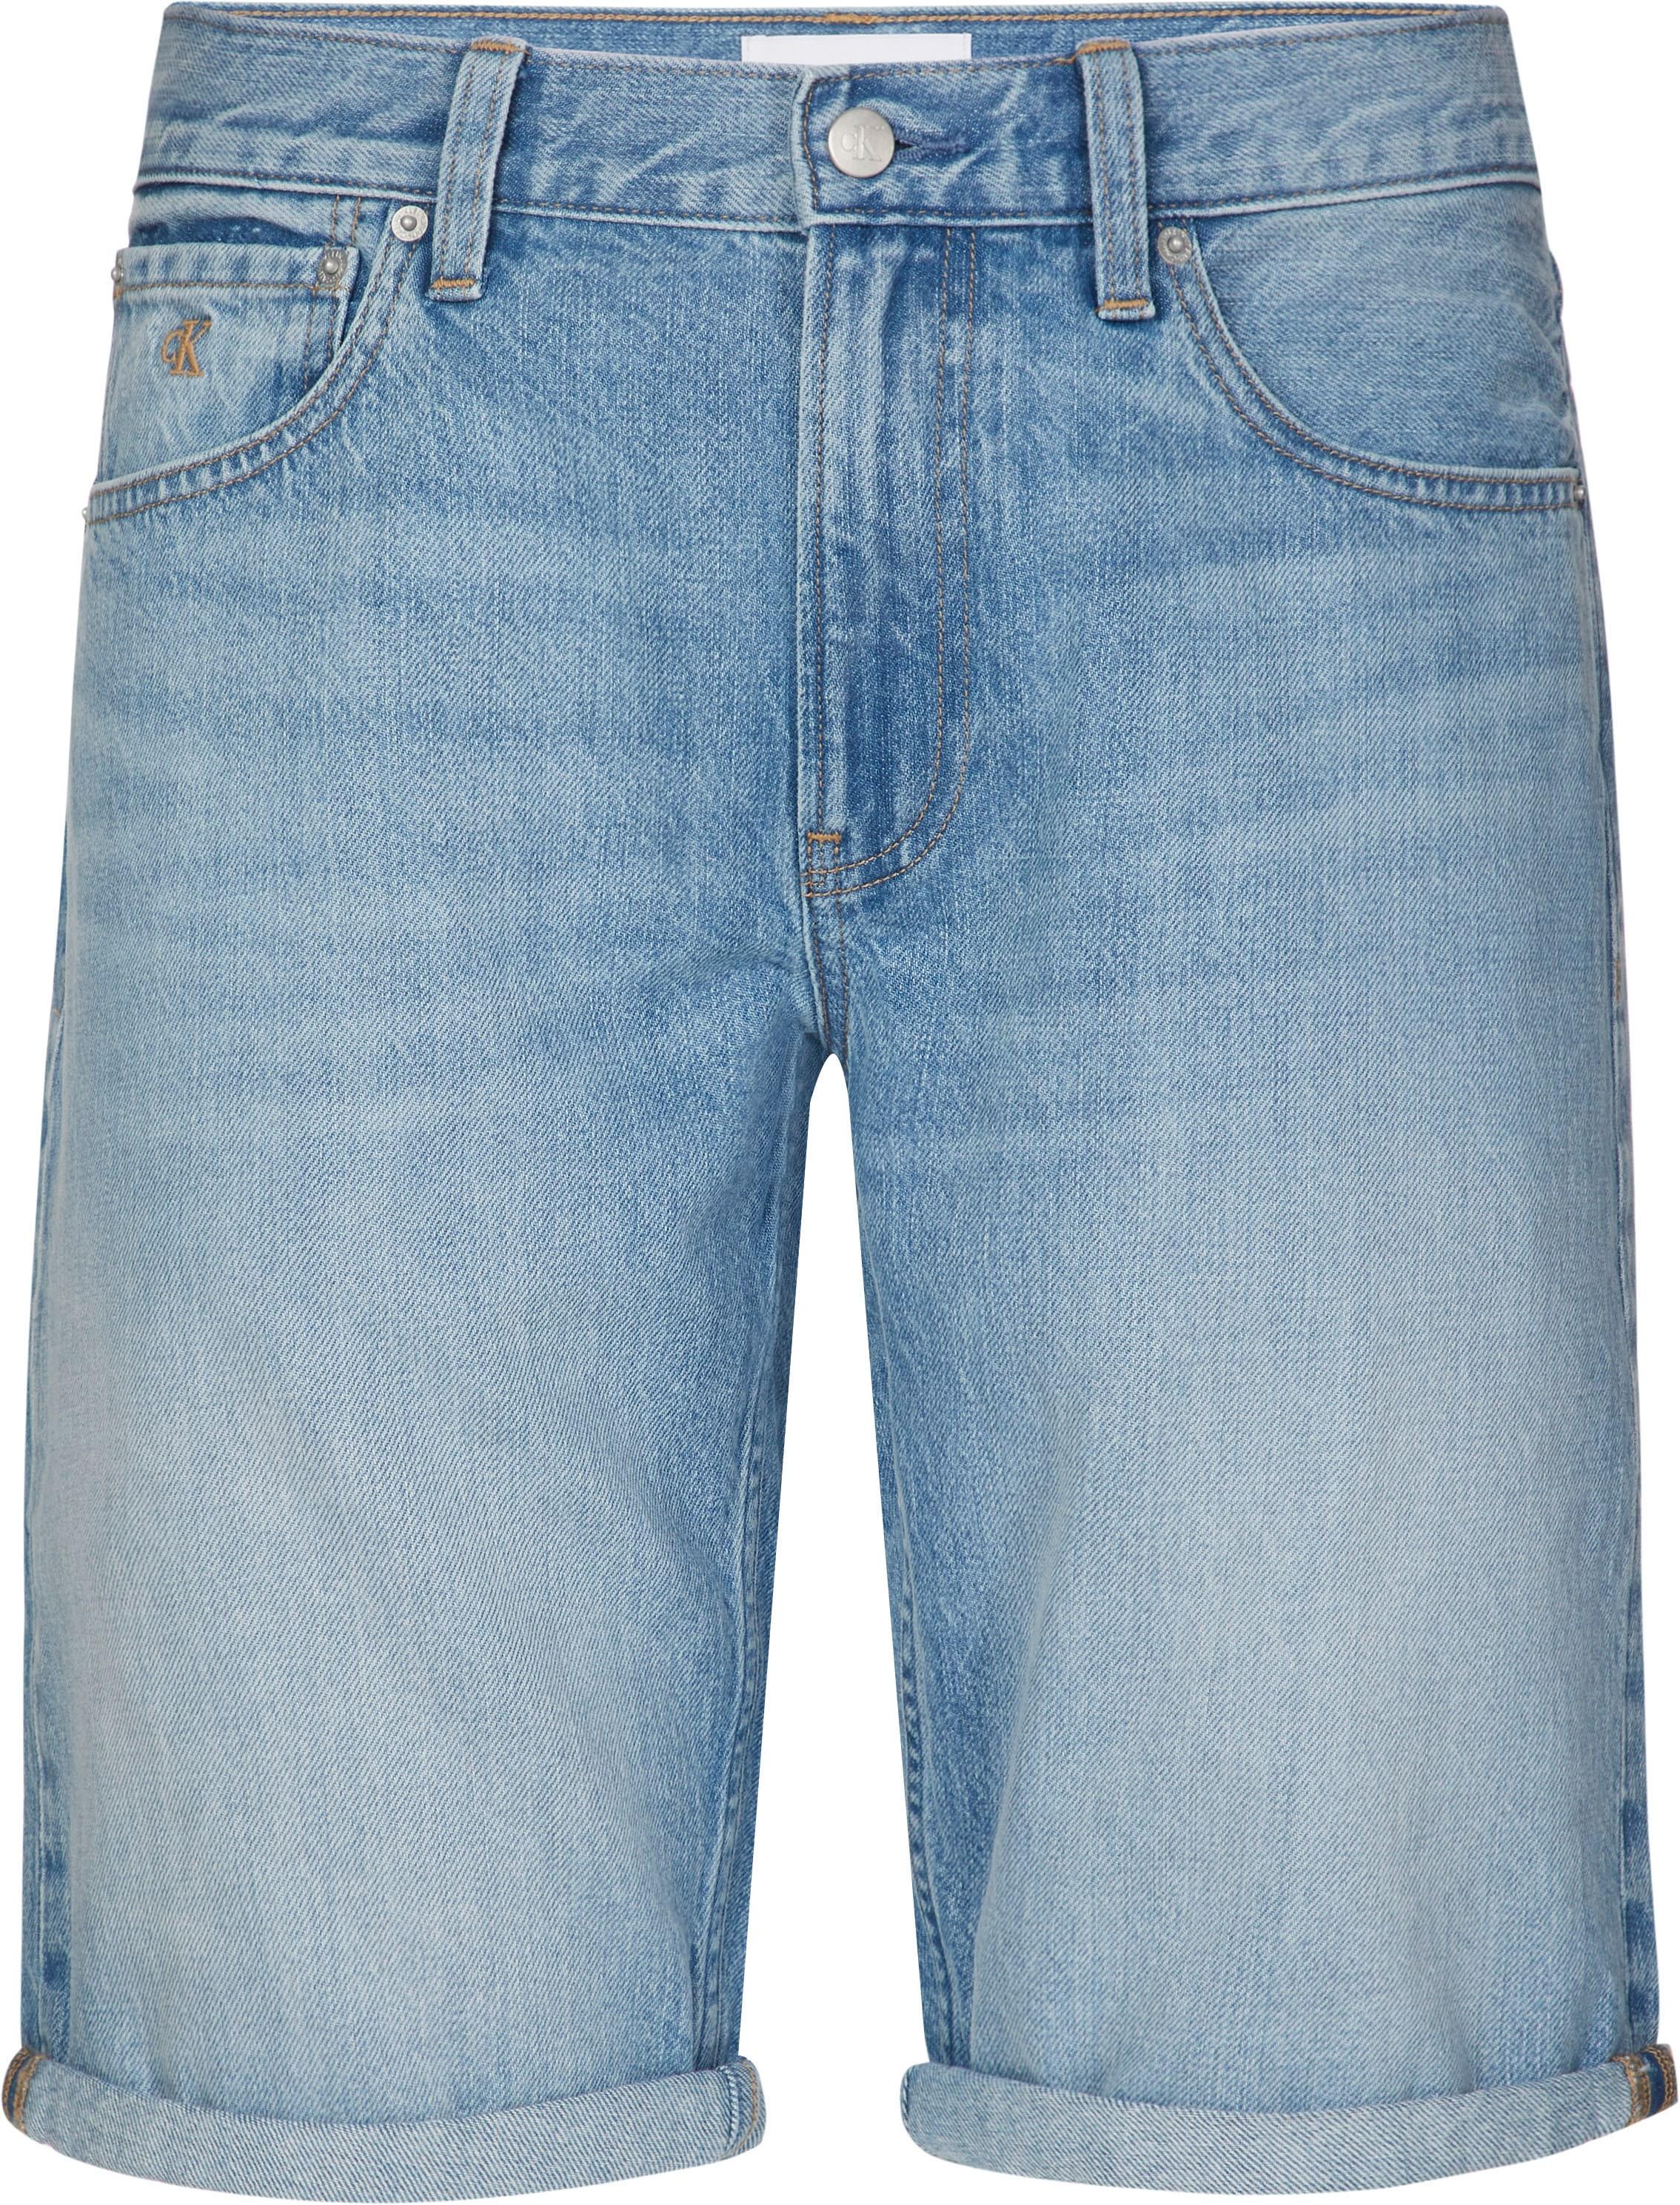 Calvin Klein Jeans Jeansshorts REGULAR SHORT | Bekleidung > Shorts & Bermudas > Jeans Shorts | Calvin Klein Jeans